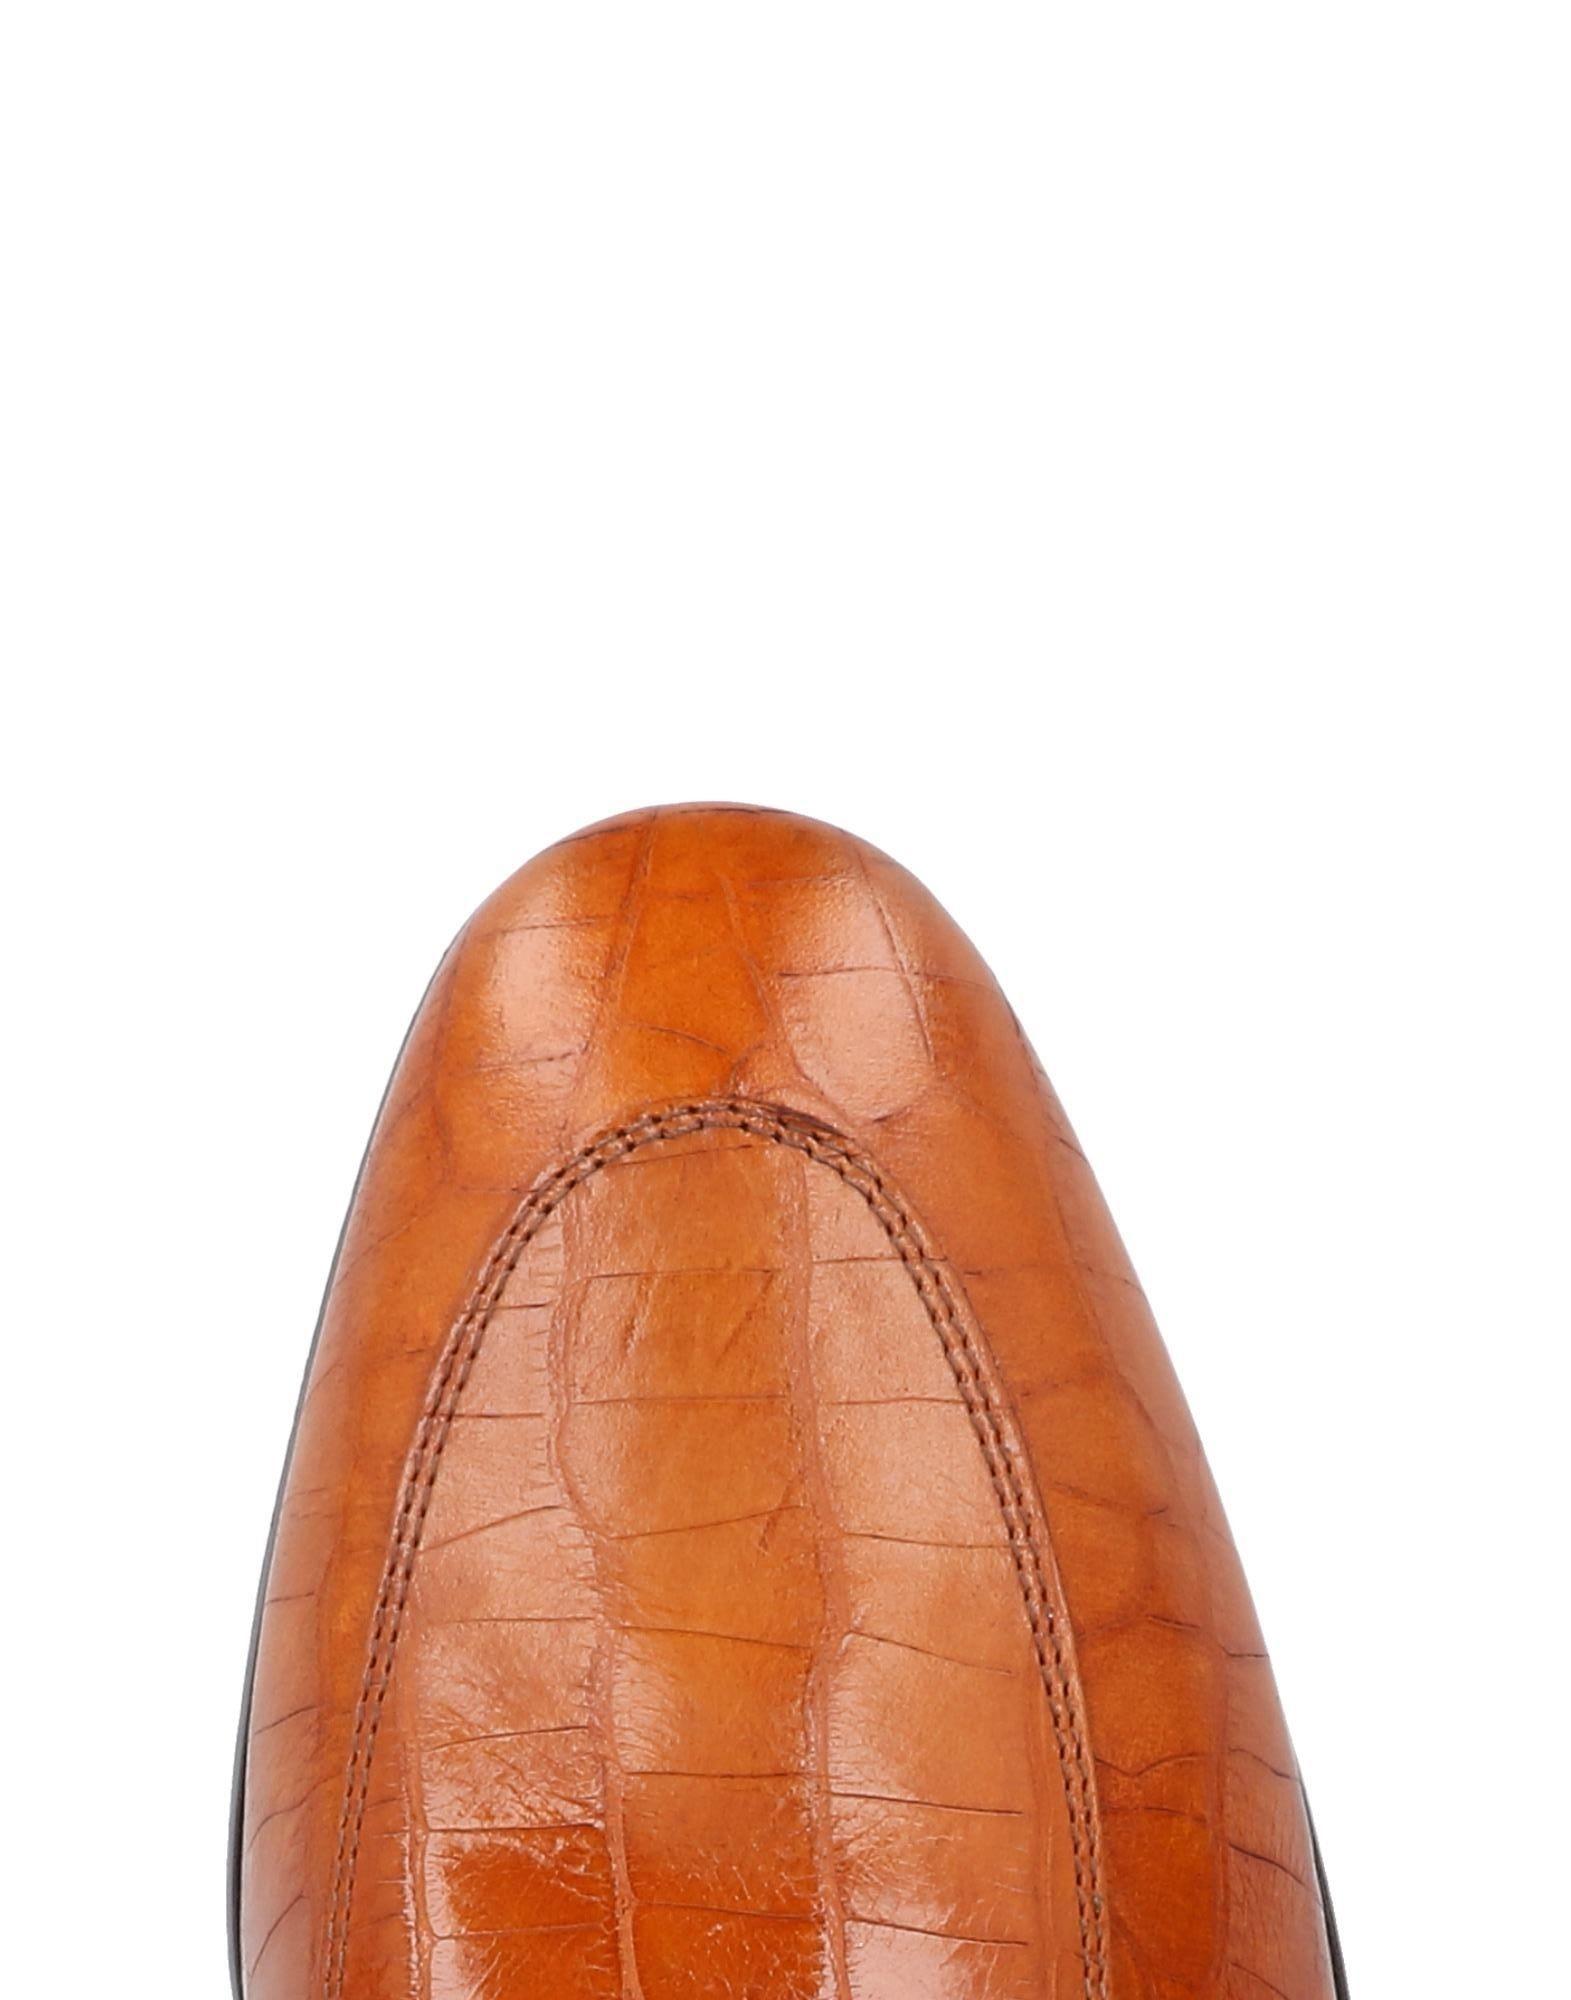 Giovanni Conti Mokassins Herren beliebte  11432415WN Gute Qualität beliebte Herren Schuhe 3d1e85